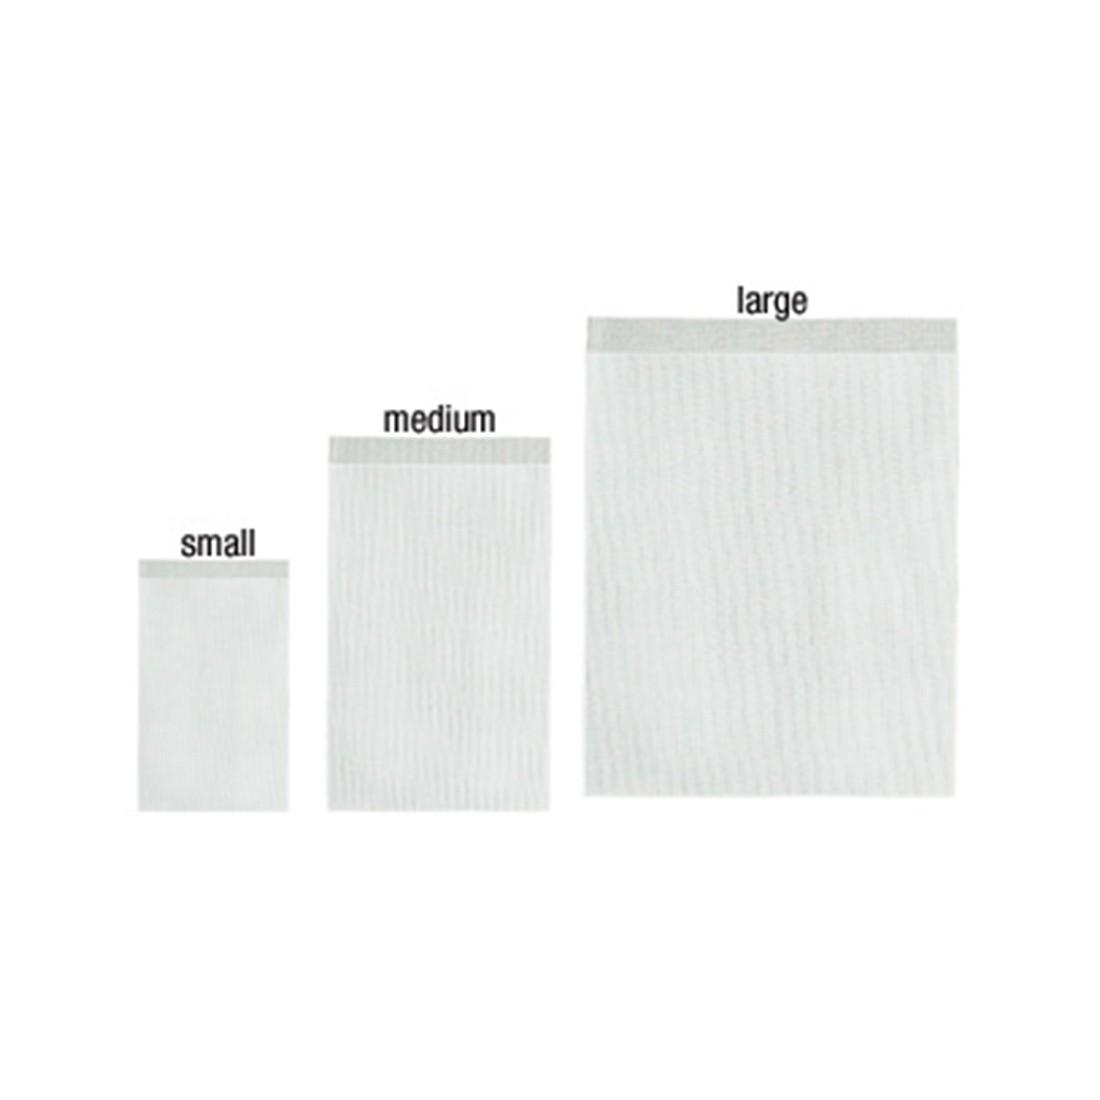 Biopsy Bags, Small (Nylon Mesh)